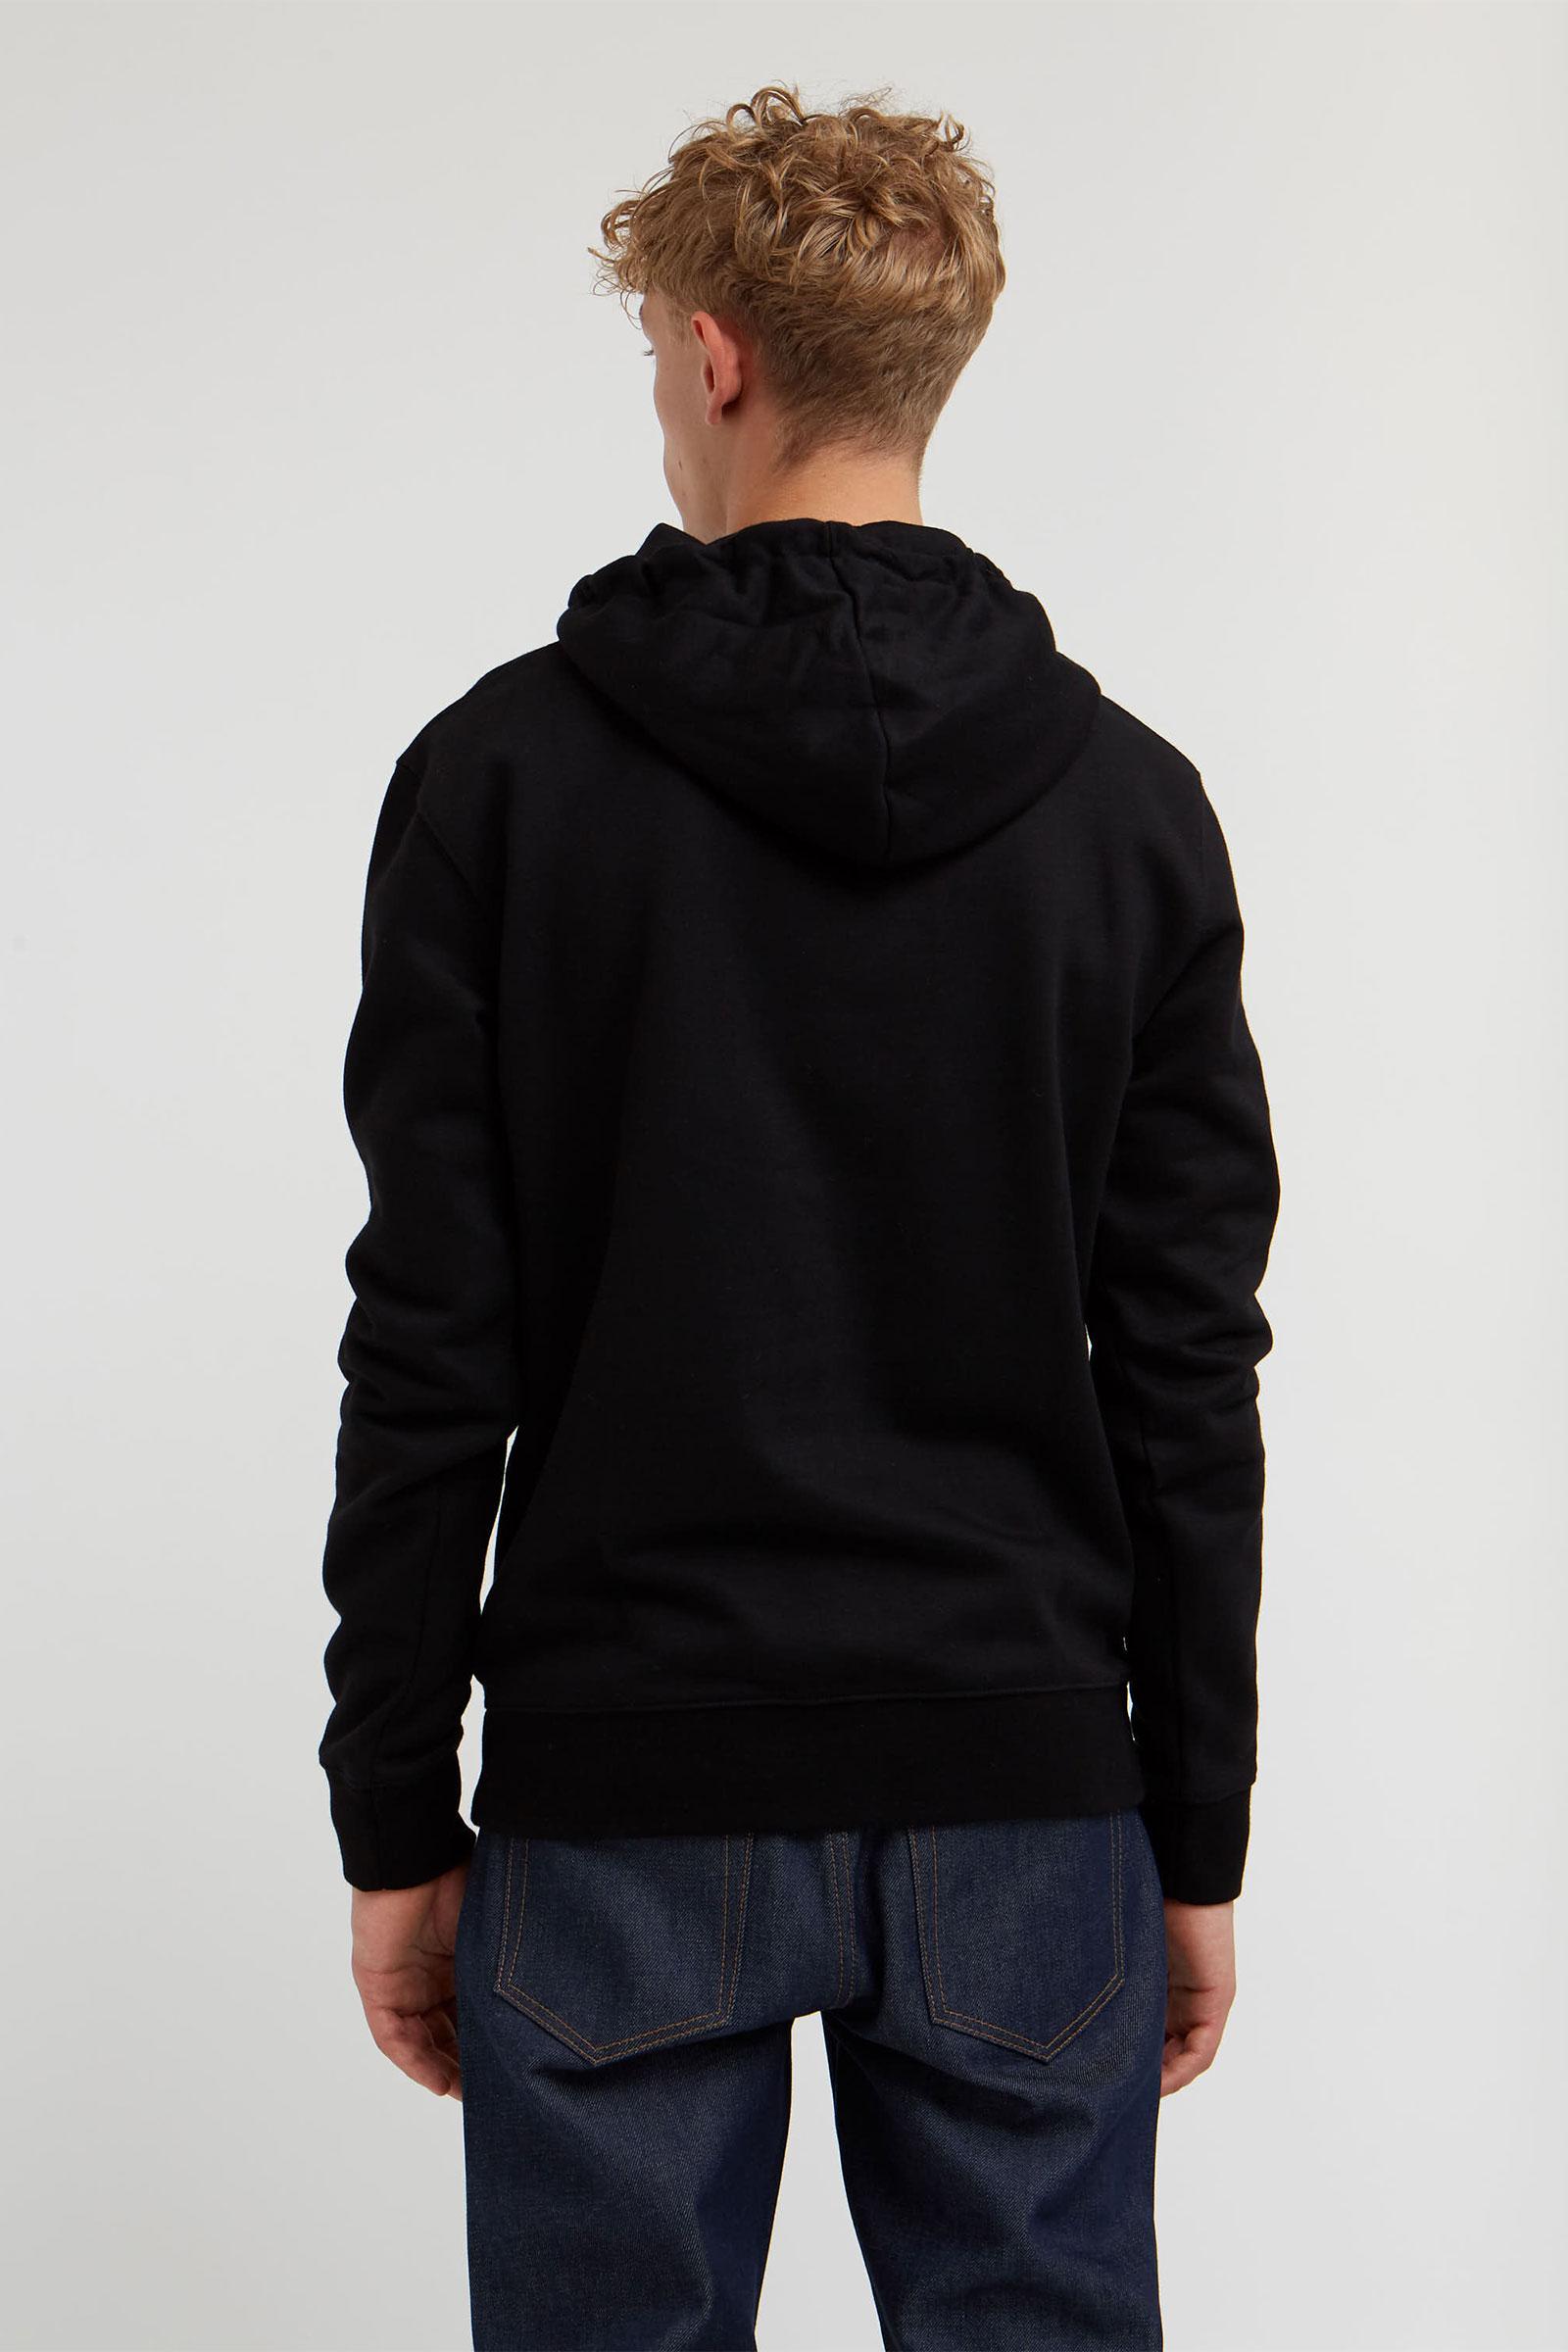 Wood Wood Ian hoodie, black, x-small